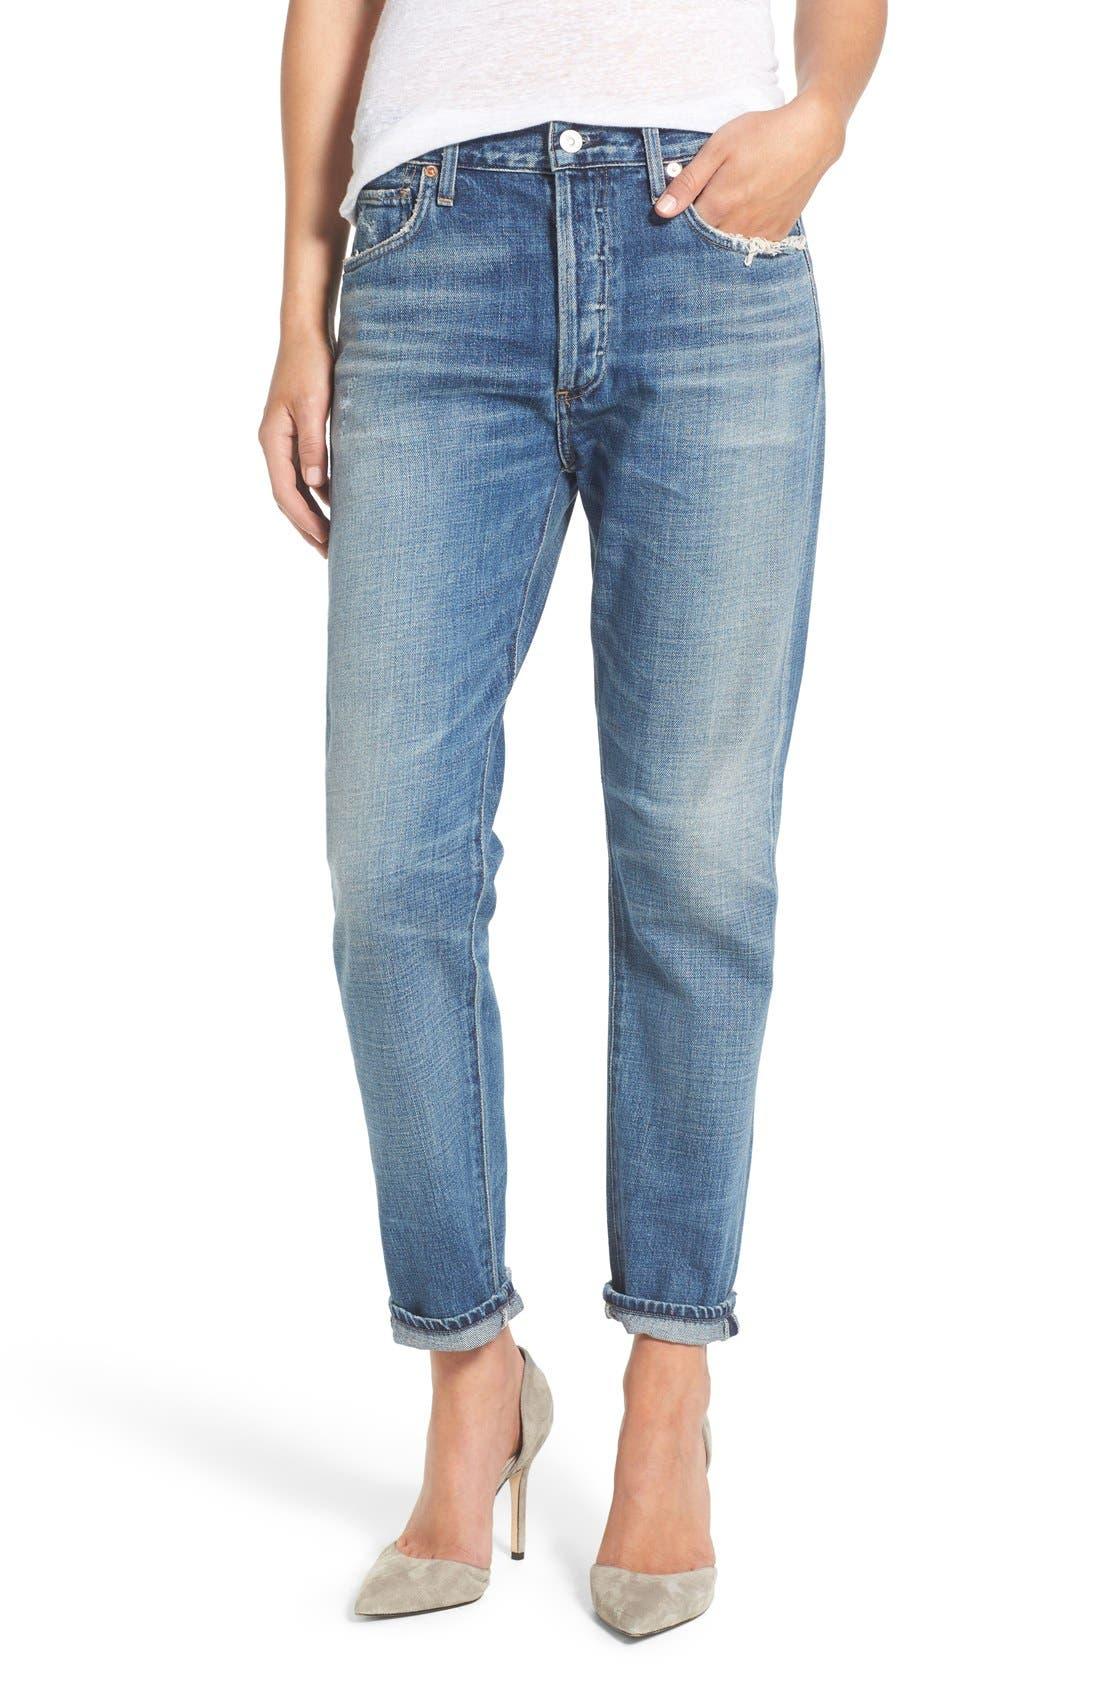 Liya High Waist Slim Boyfriend Jeans,                         Main,                         color, Fade Out